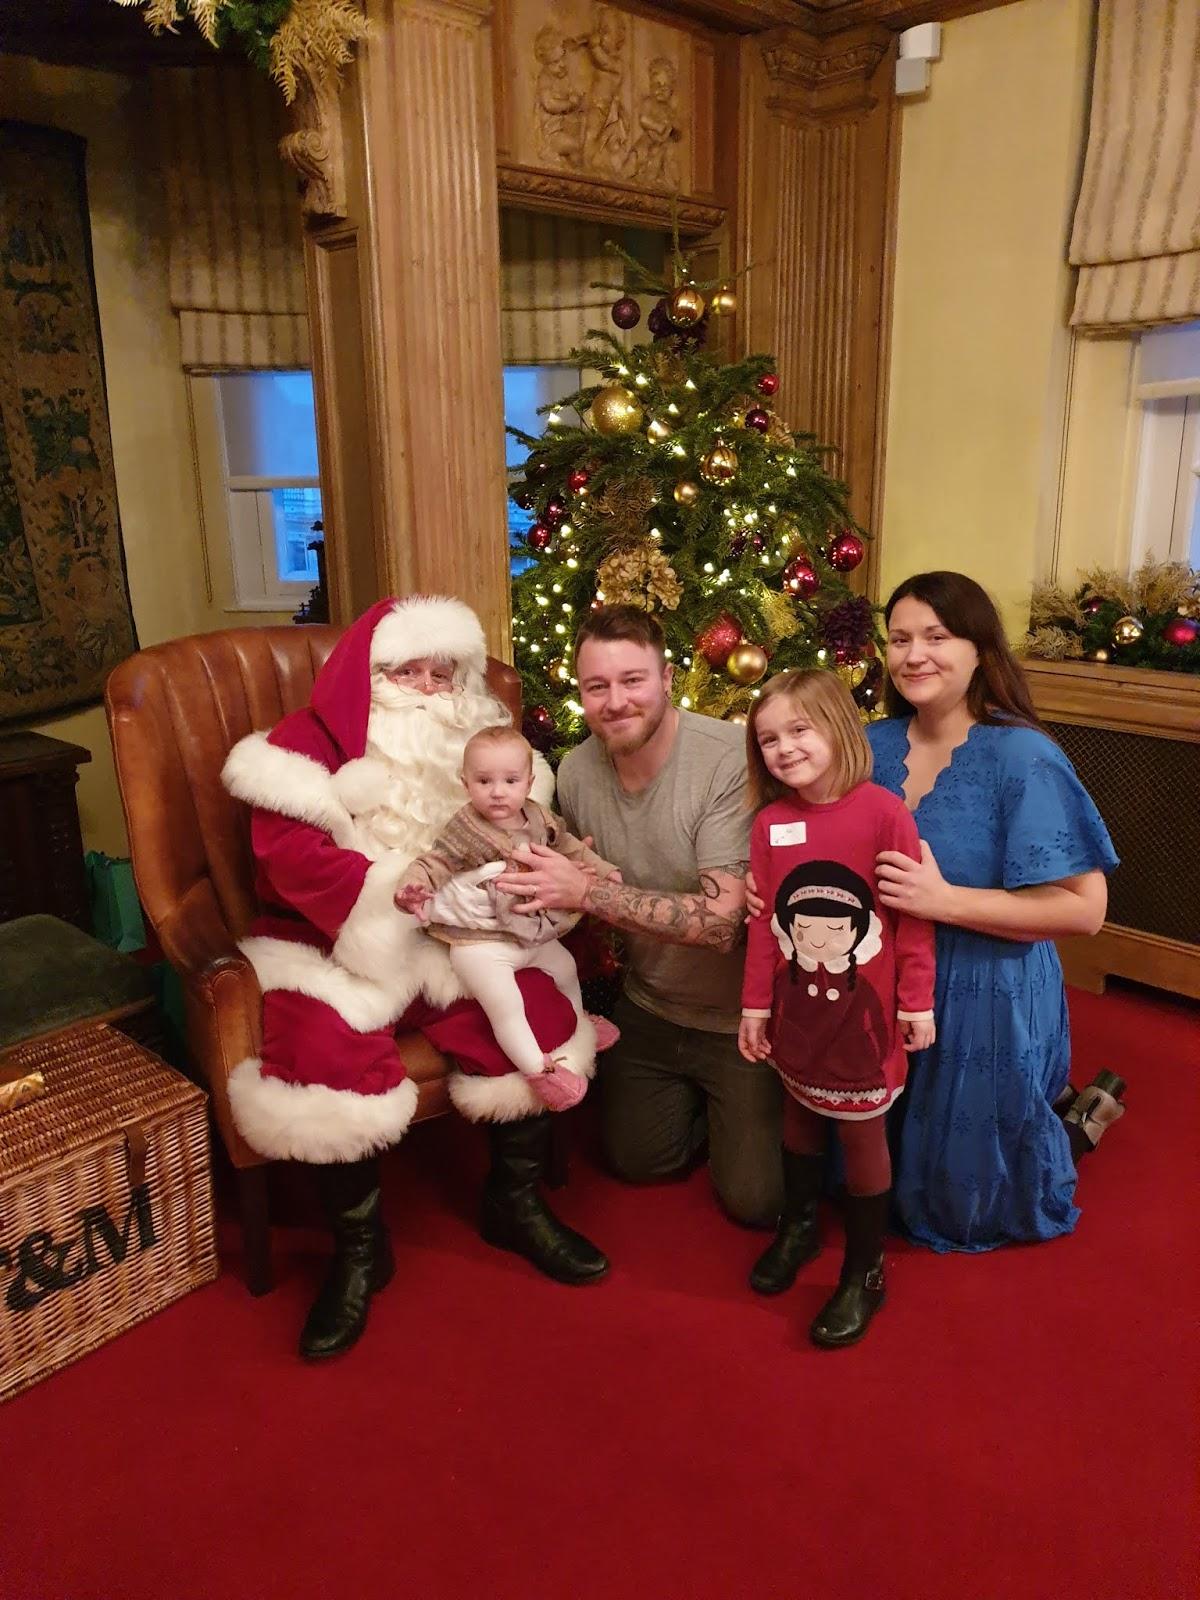 fortnum & mason santa family picture